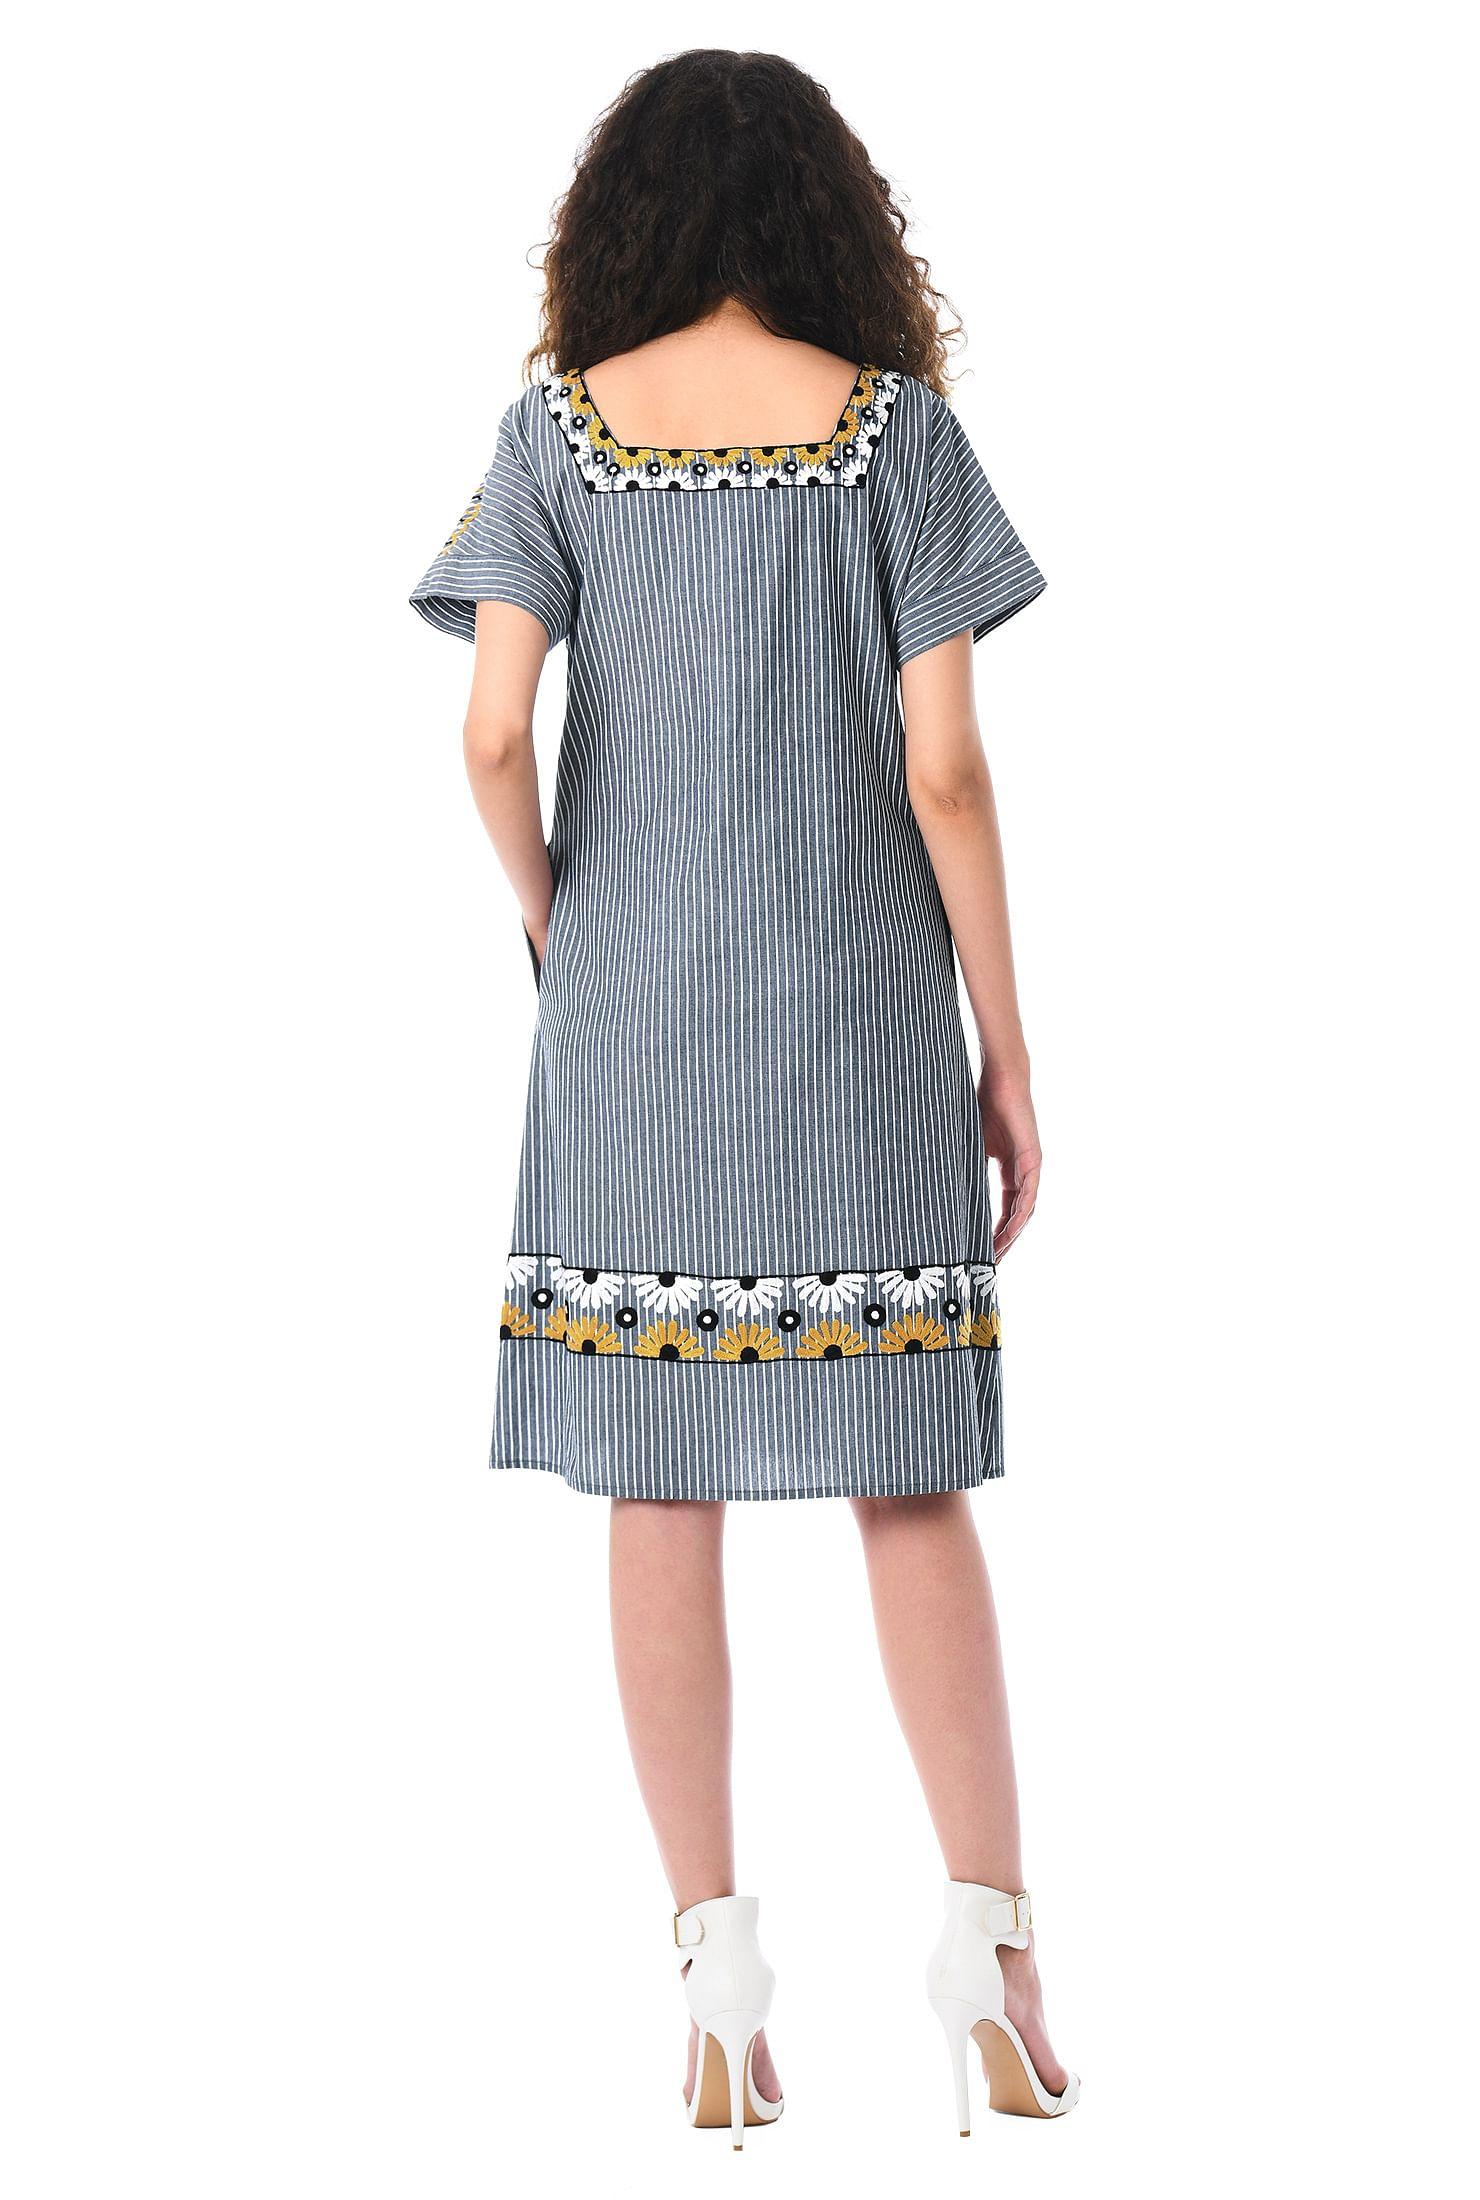 Womens Stripe Shift Dress Simply Be